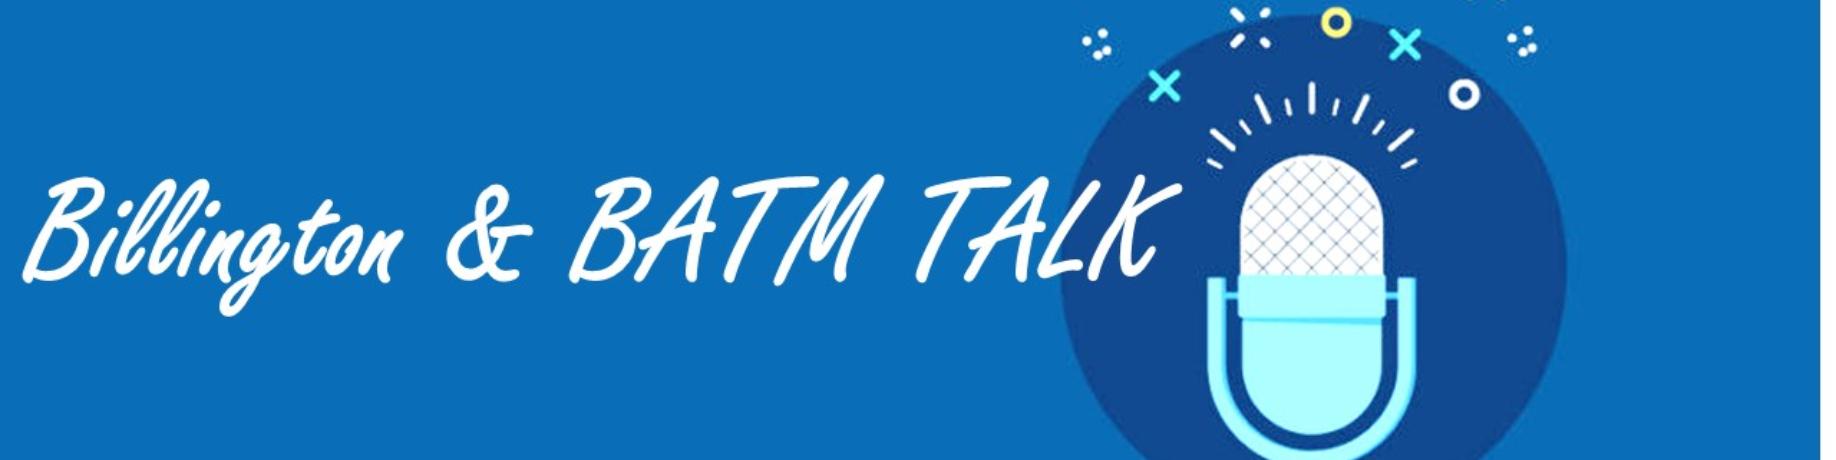 Billington老師的 【BATM 教育TALK】